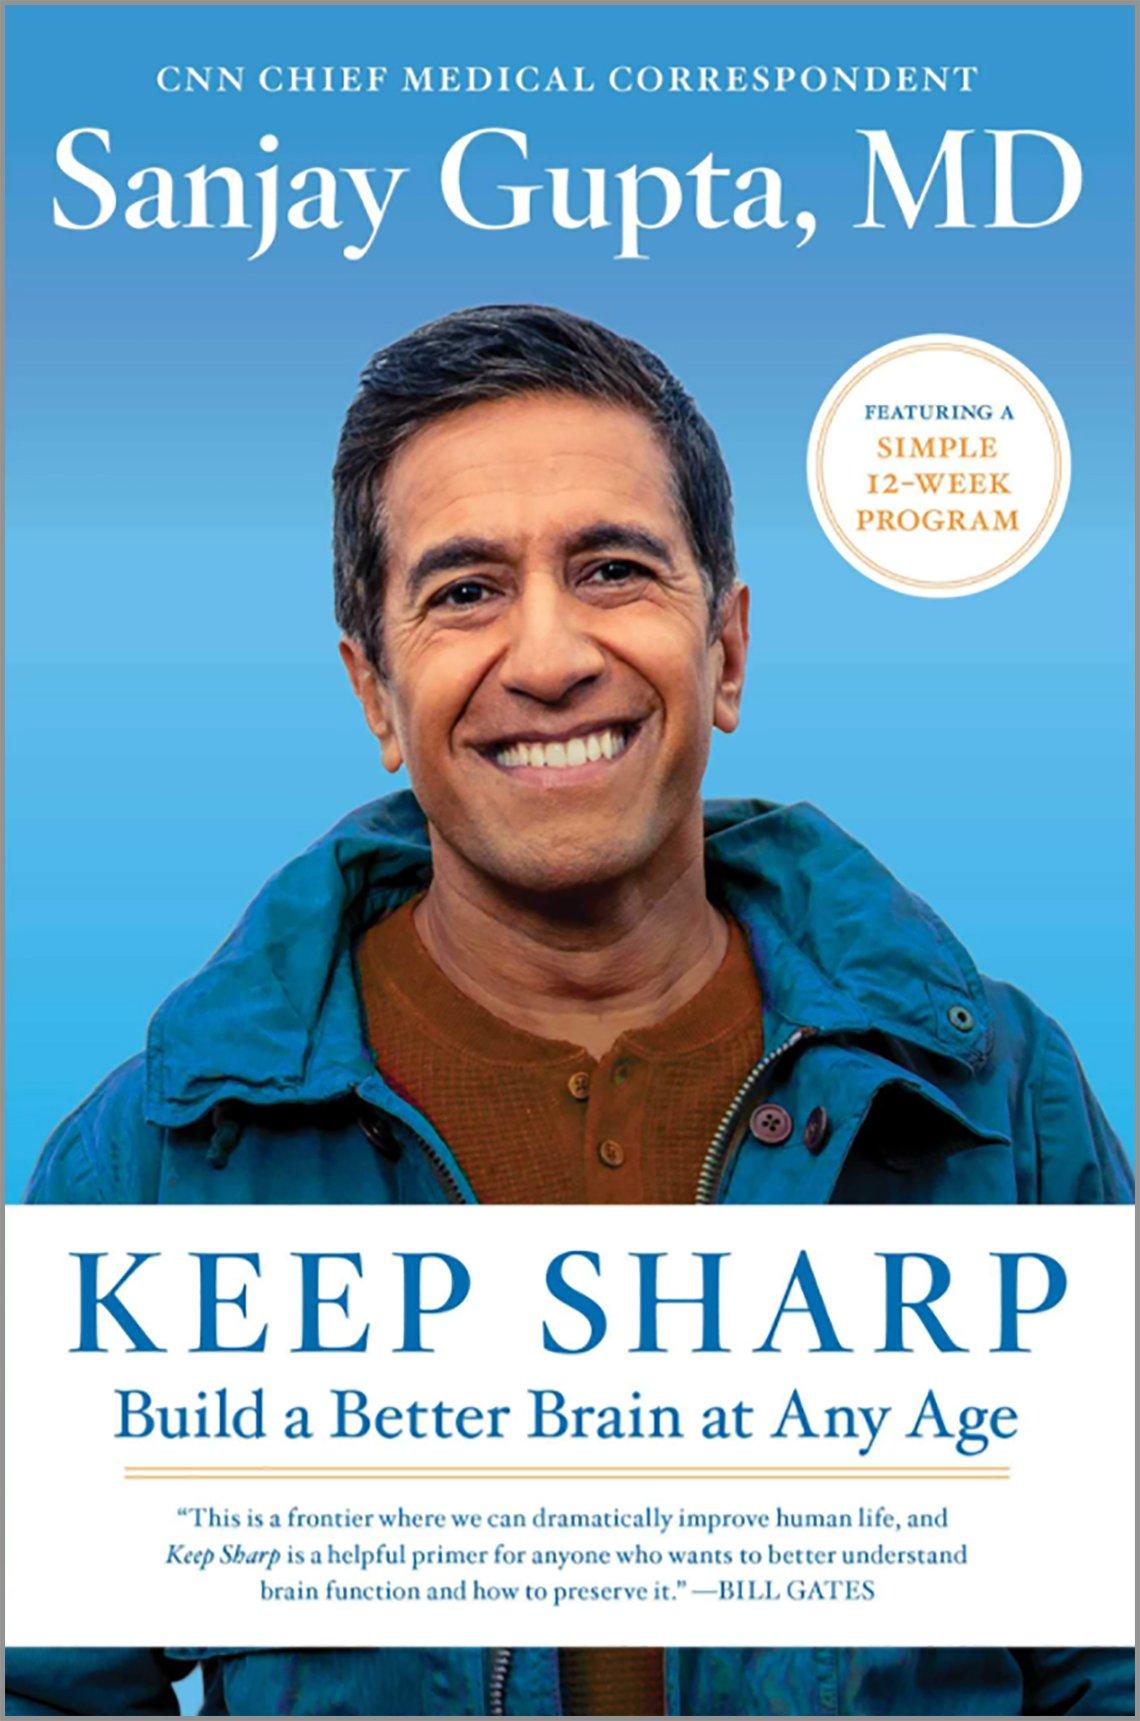 keep sharp build a better brain at any age by sanjay gupta